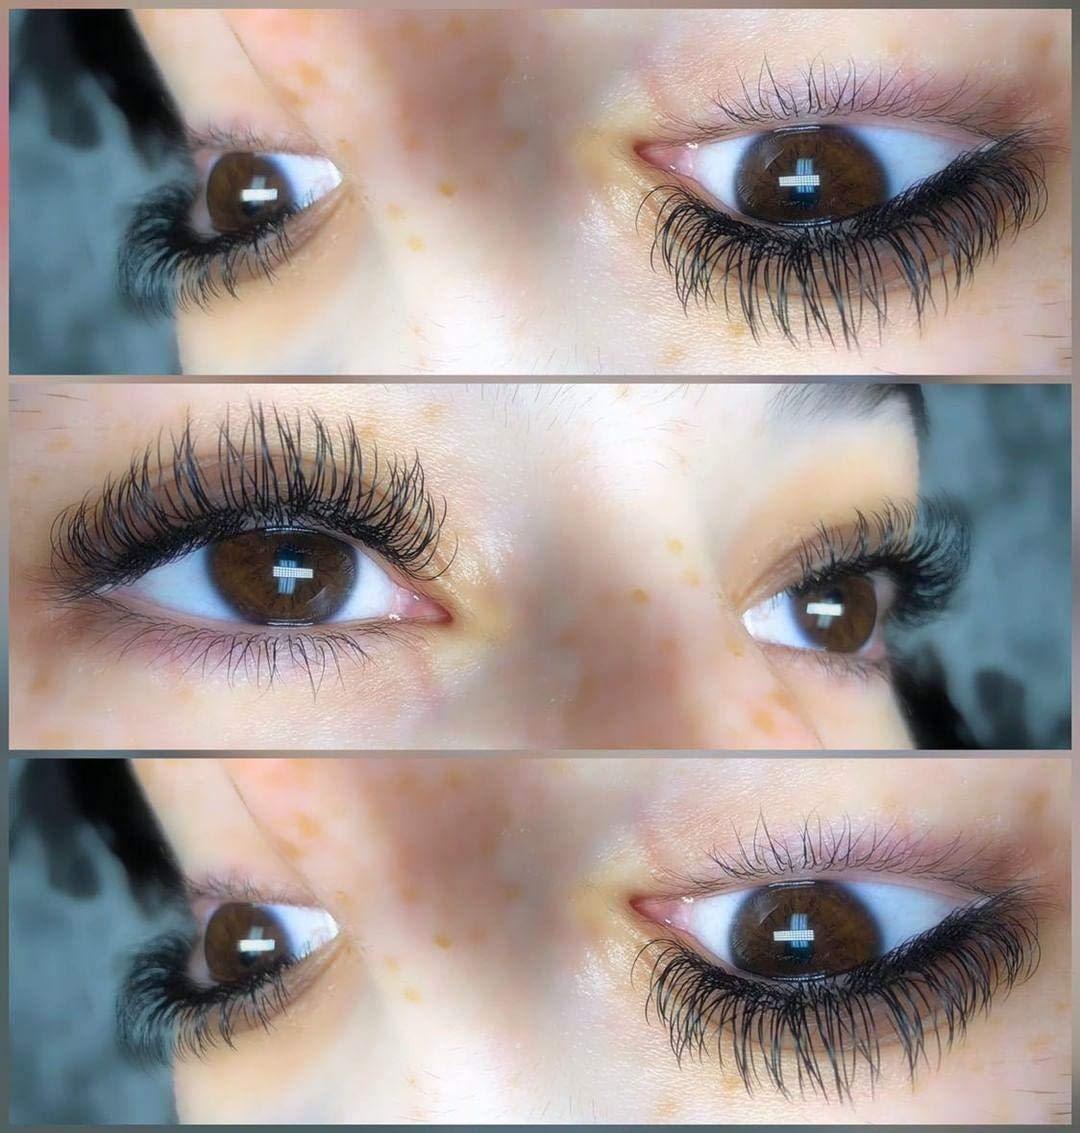 2e8b4c9afc4 Amazon.com : Ellipse Eyelash Extensions 0.15mm DD Curl 8-15mm Mixed Flat Eyelash  Extension supplies Light Lashes Matte Individual Eyelashes Salon Use Black  ...